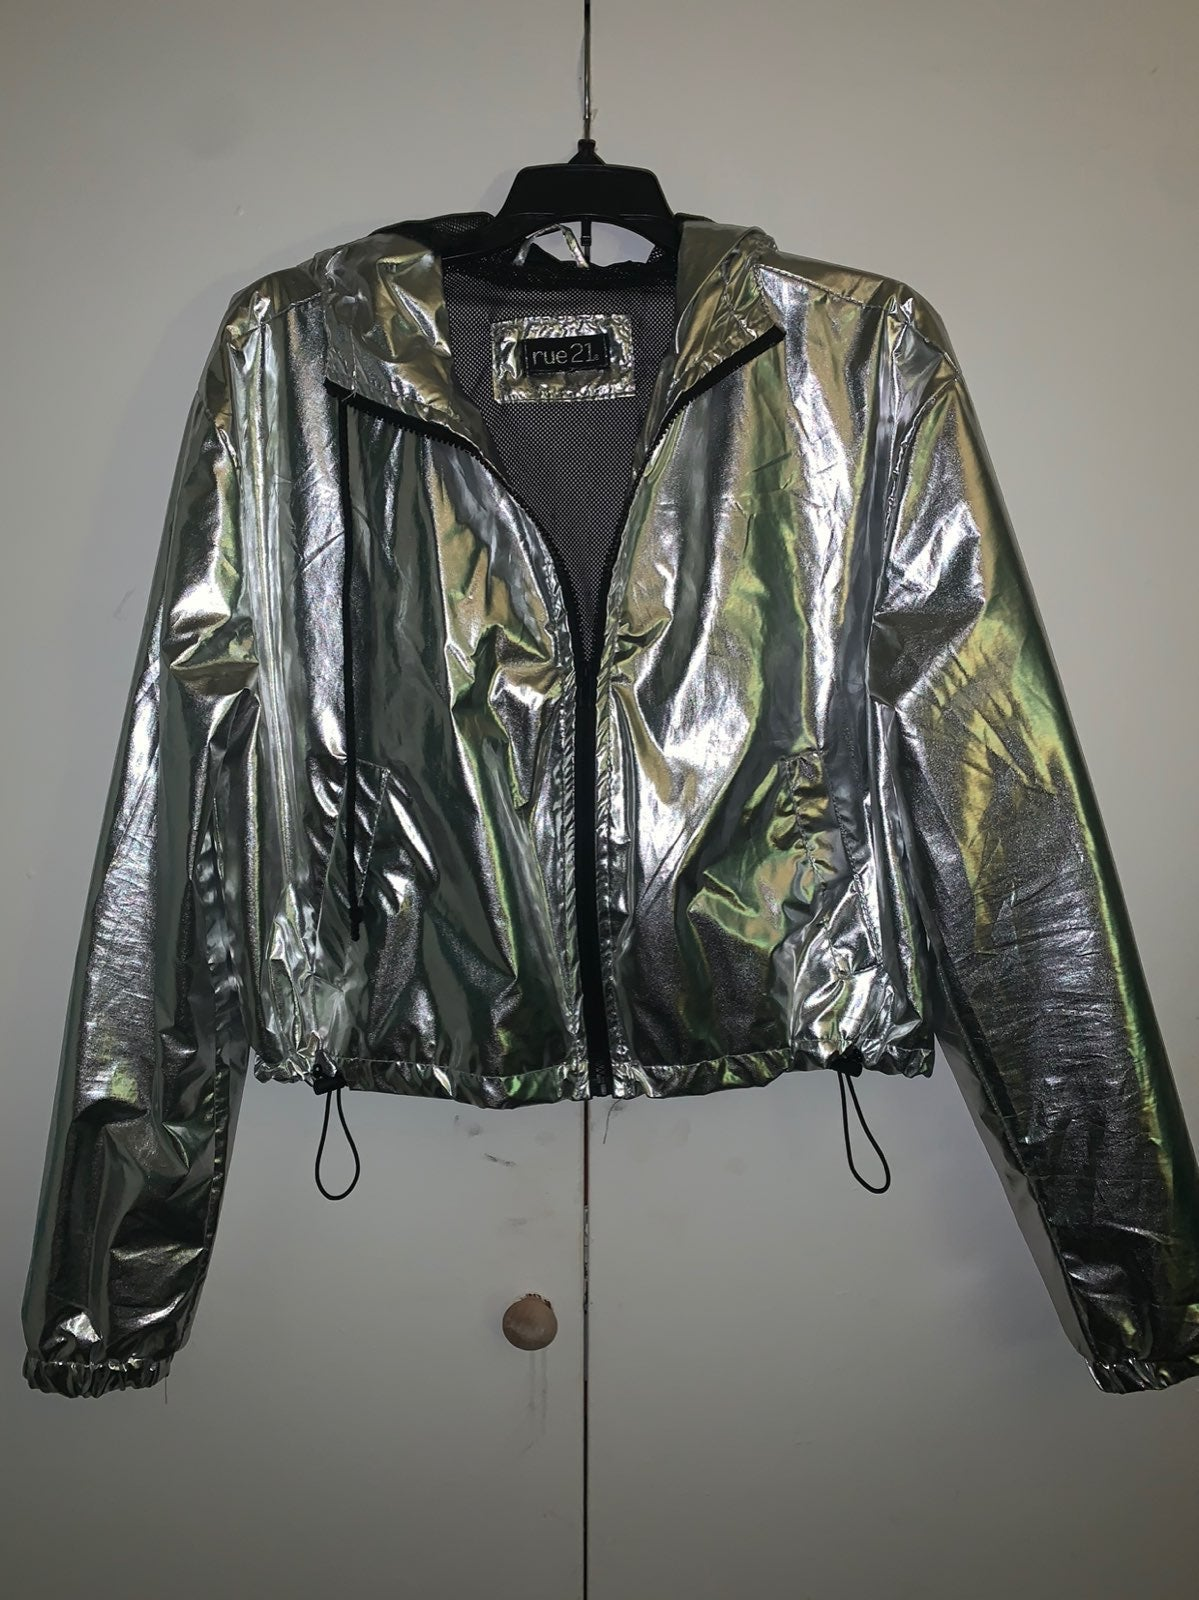 Reflective jacket (rue 21)